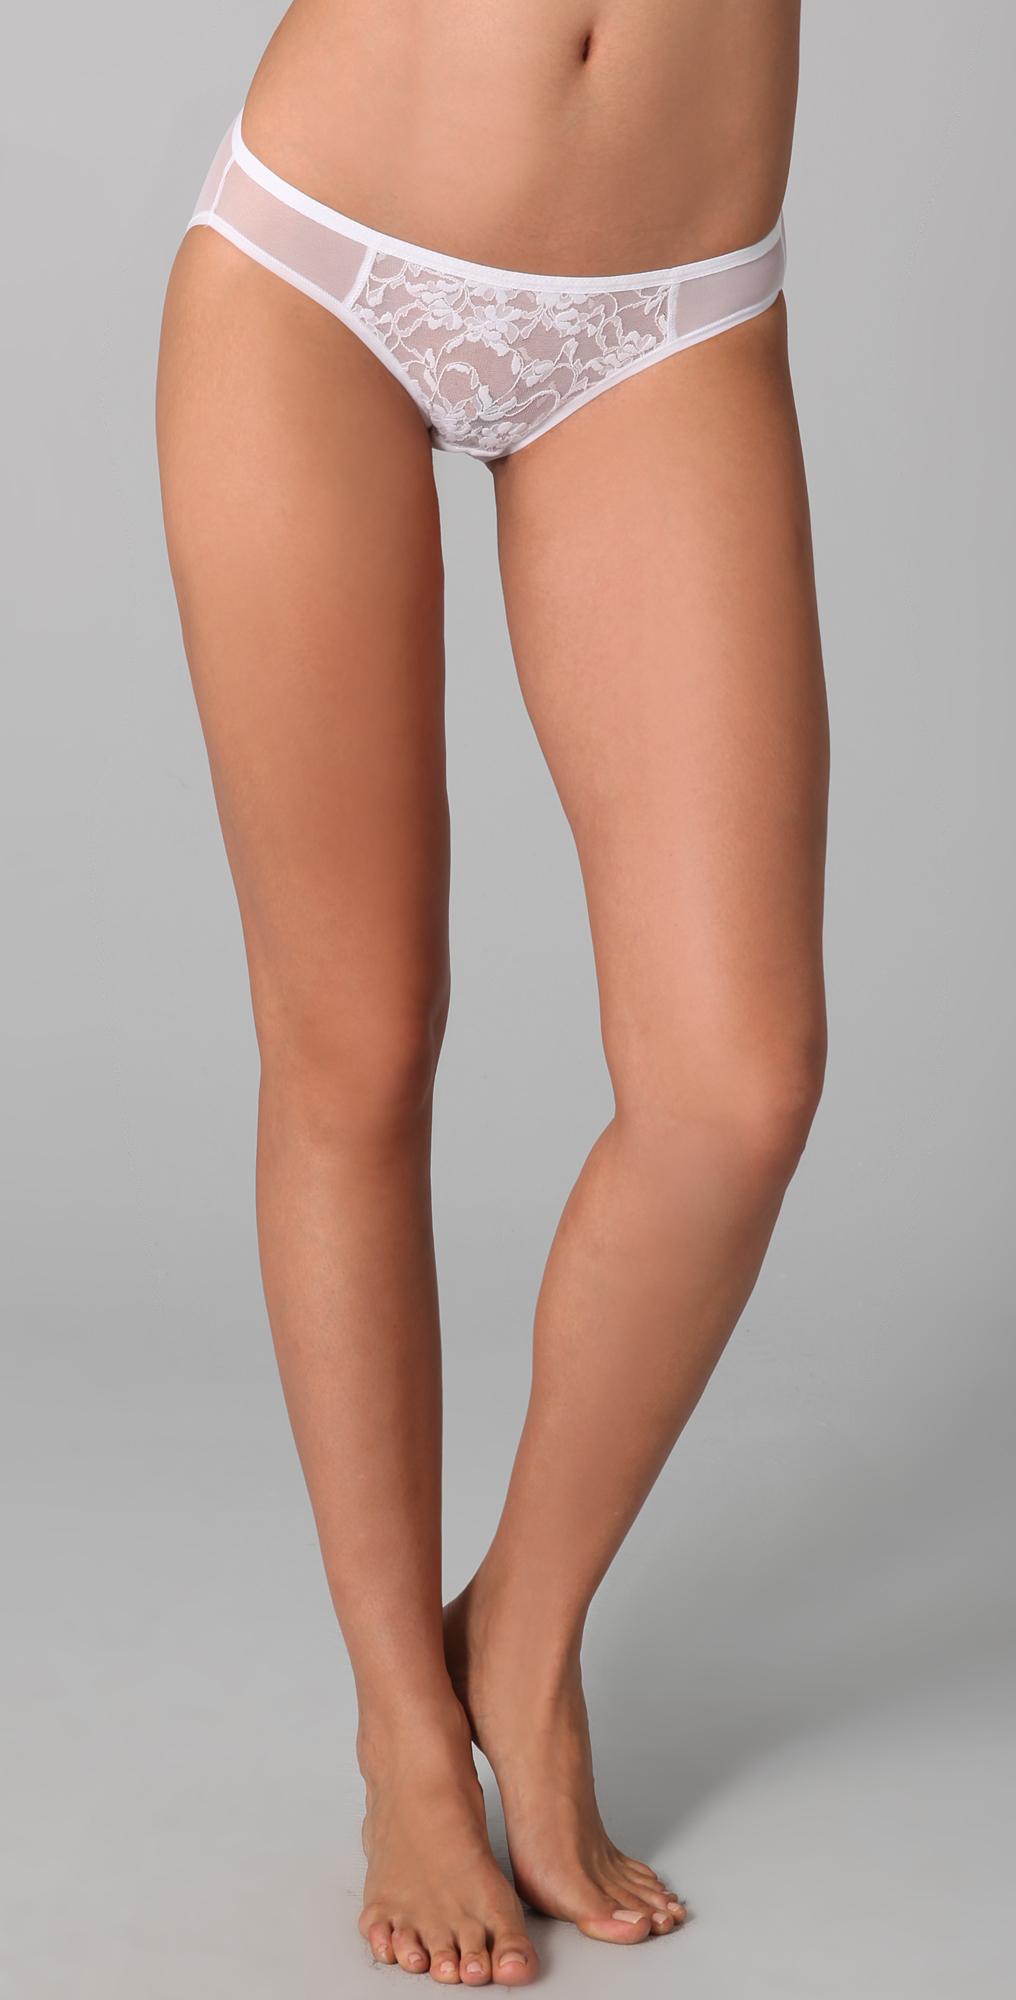 10f9a15dacb64 DKNY Intimates Signature Lace Bikini on PopScreen